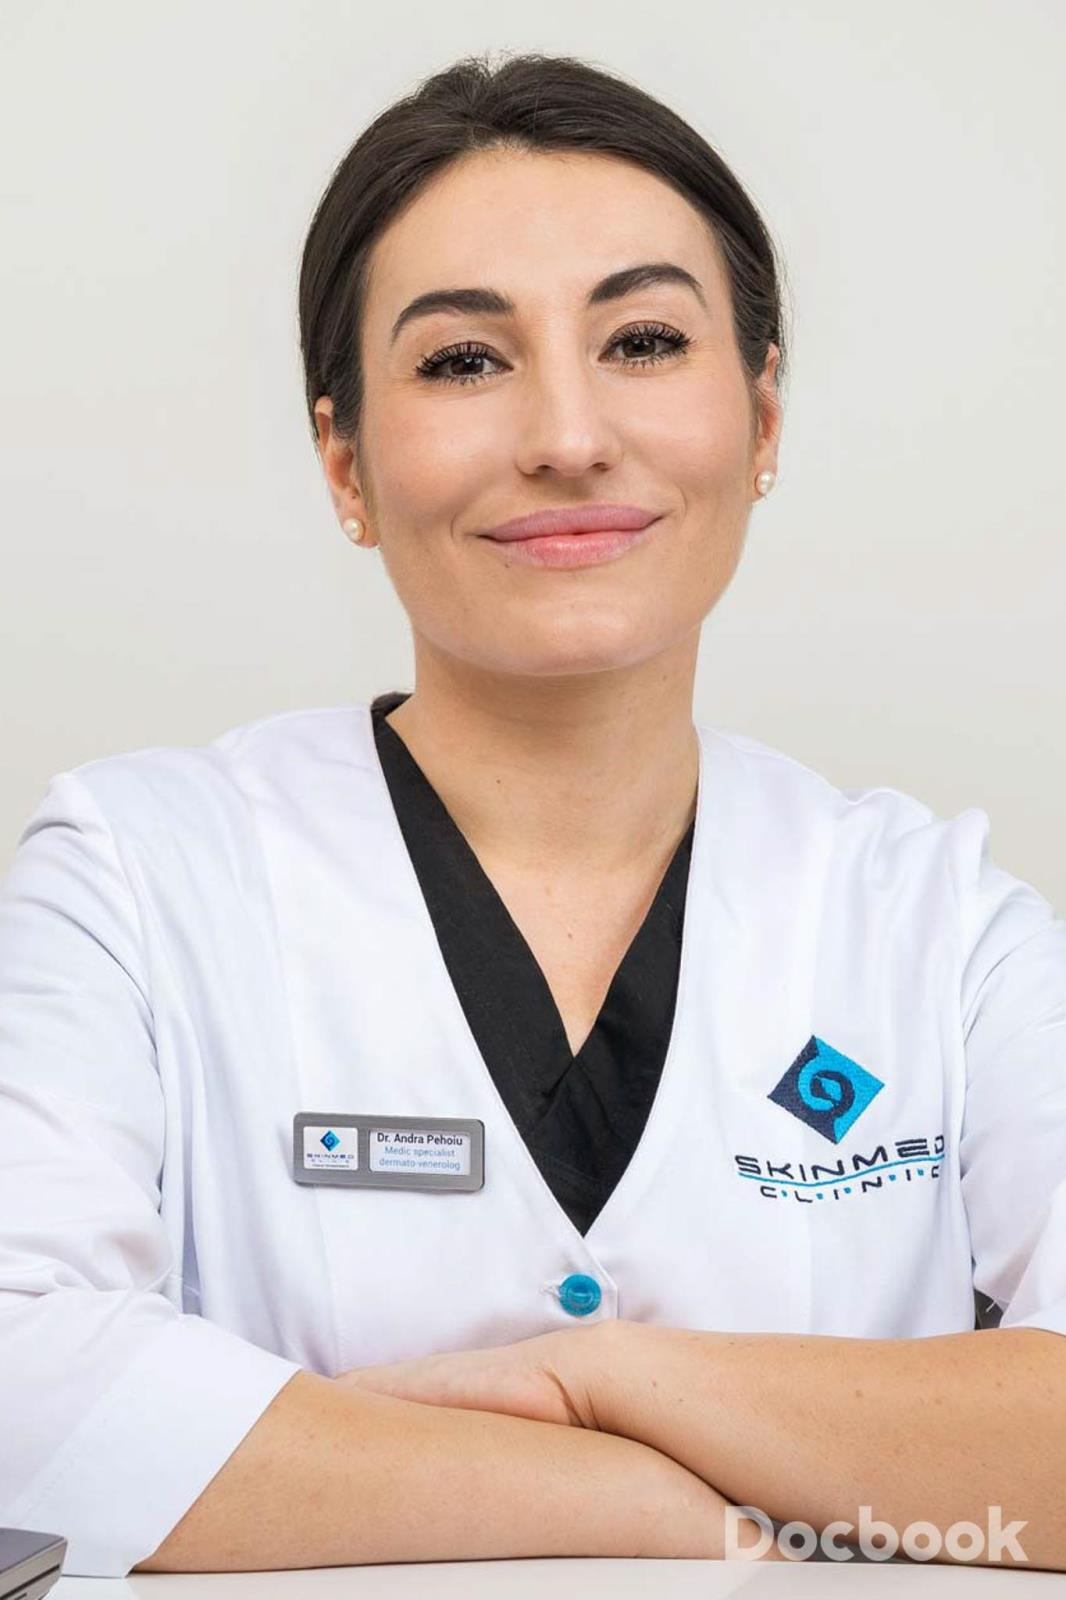 Dr. Andra Pehoiu